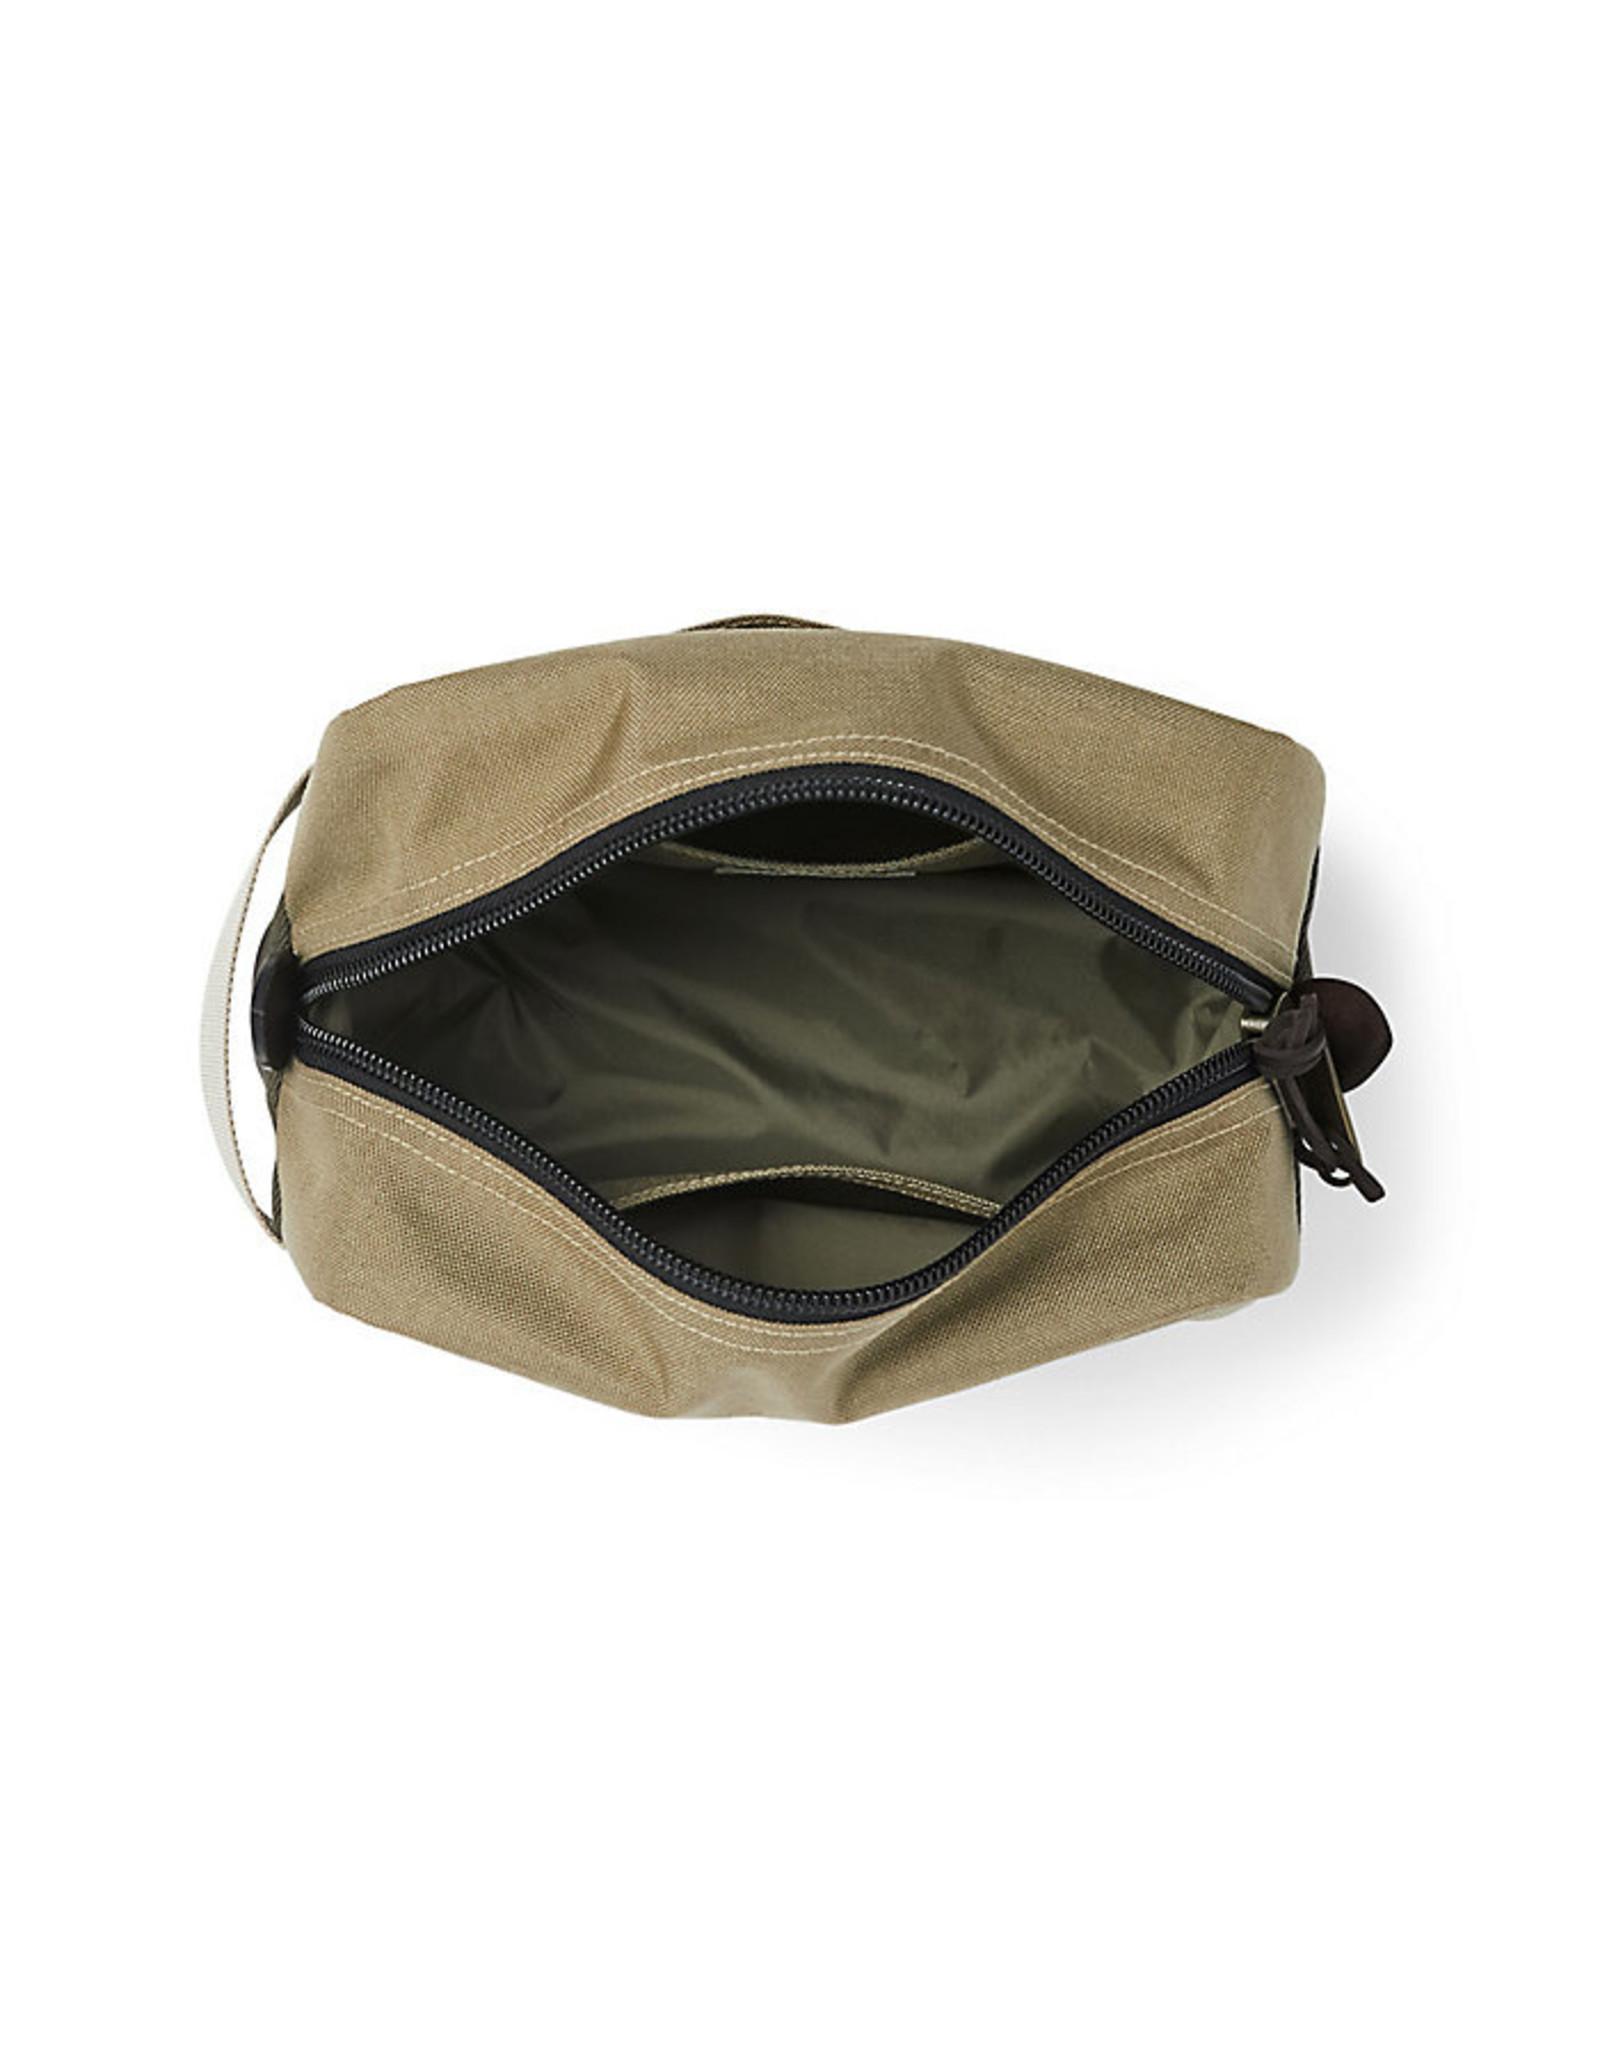 Bags FILSON 20195532 Ducks Unlimited Travel Pack